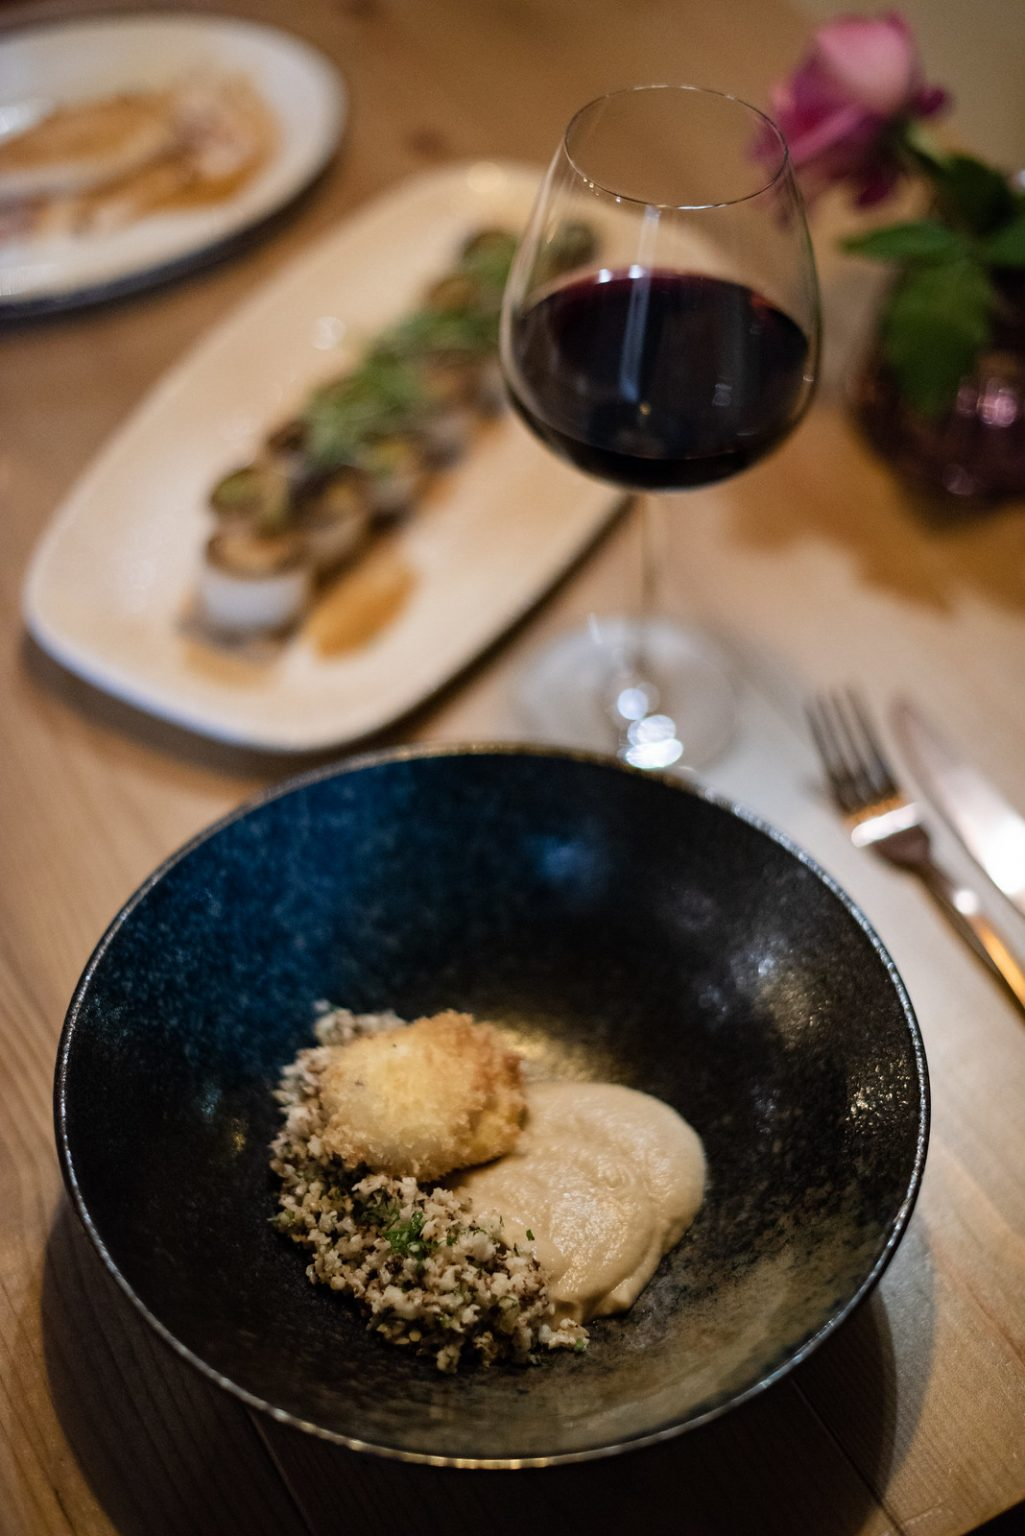 https://www.white-ibiza.com/wp-content/uploads/2020/11/cas-gasi-restaurant-2020-12-1025x1536.jpg